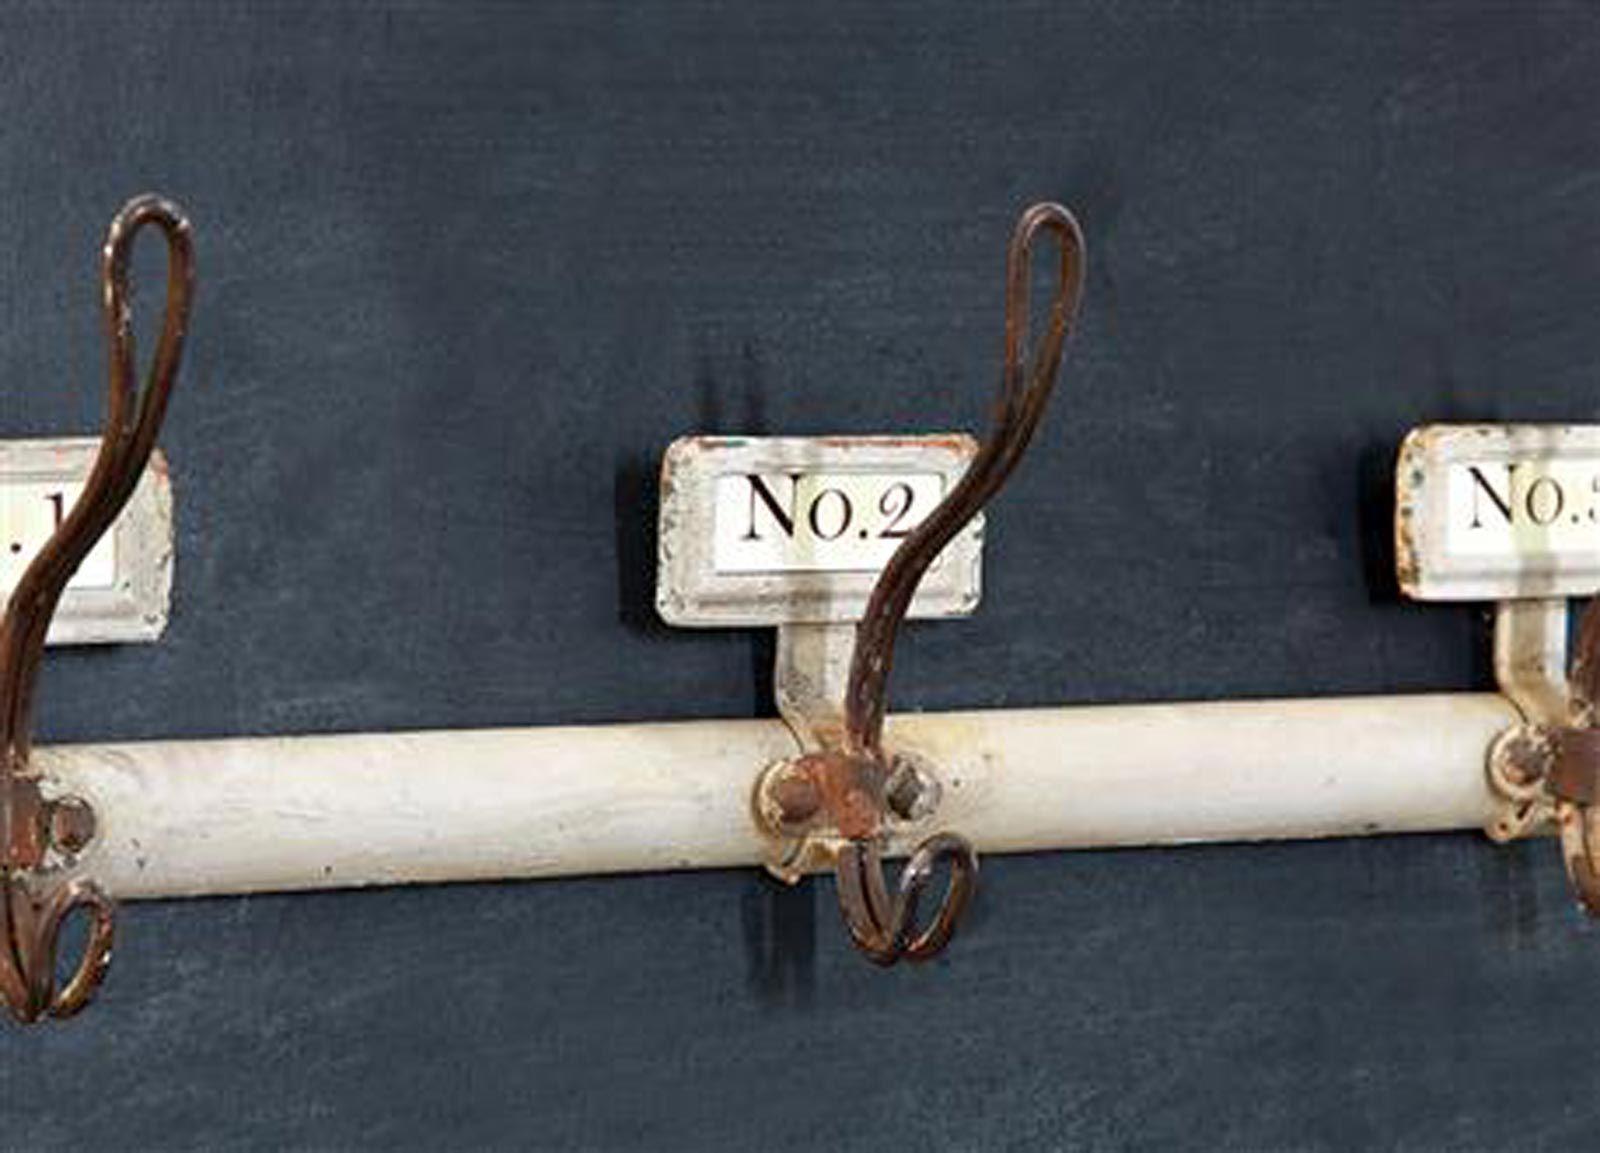 Vintage Bathroom Towel Hooks. Vintage Reproduction Ivory Metal Wall Coat Rack Bath Towel Hook